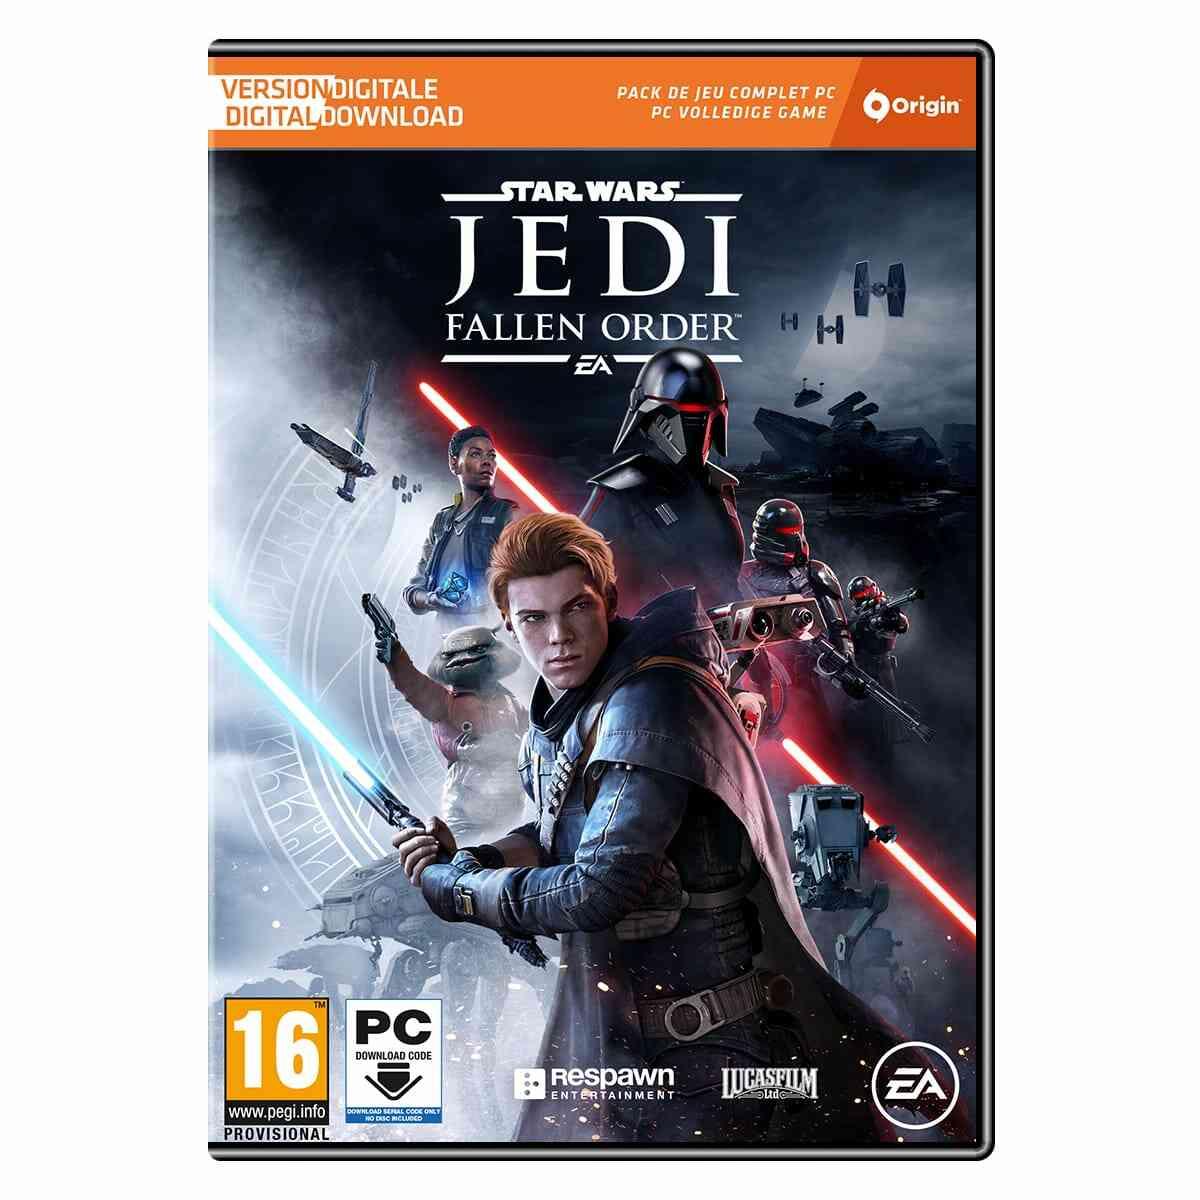 Jeux PC et Mac Electronic Arts Publishing Star wars jedi : fallen order 1